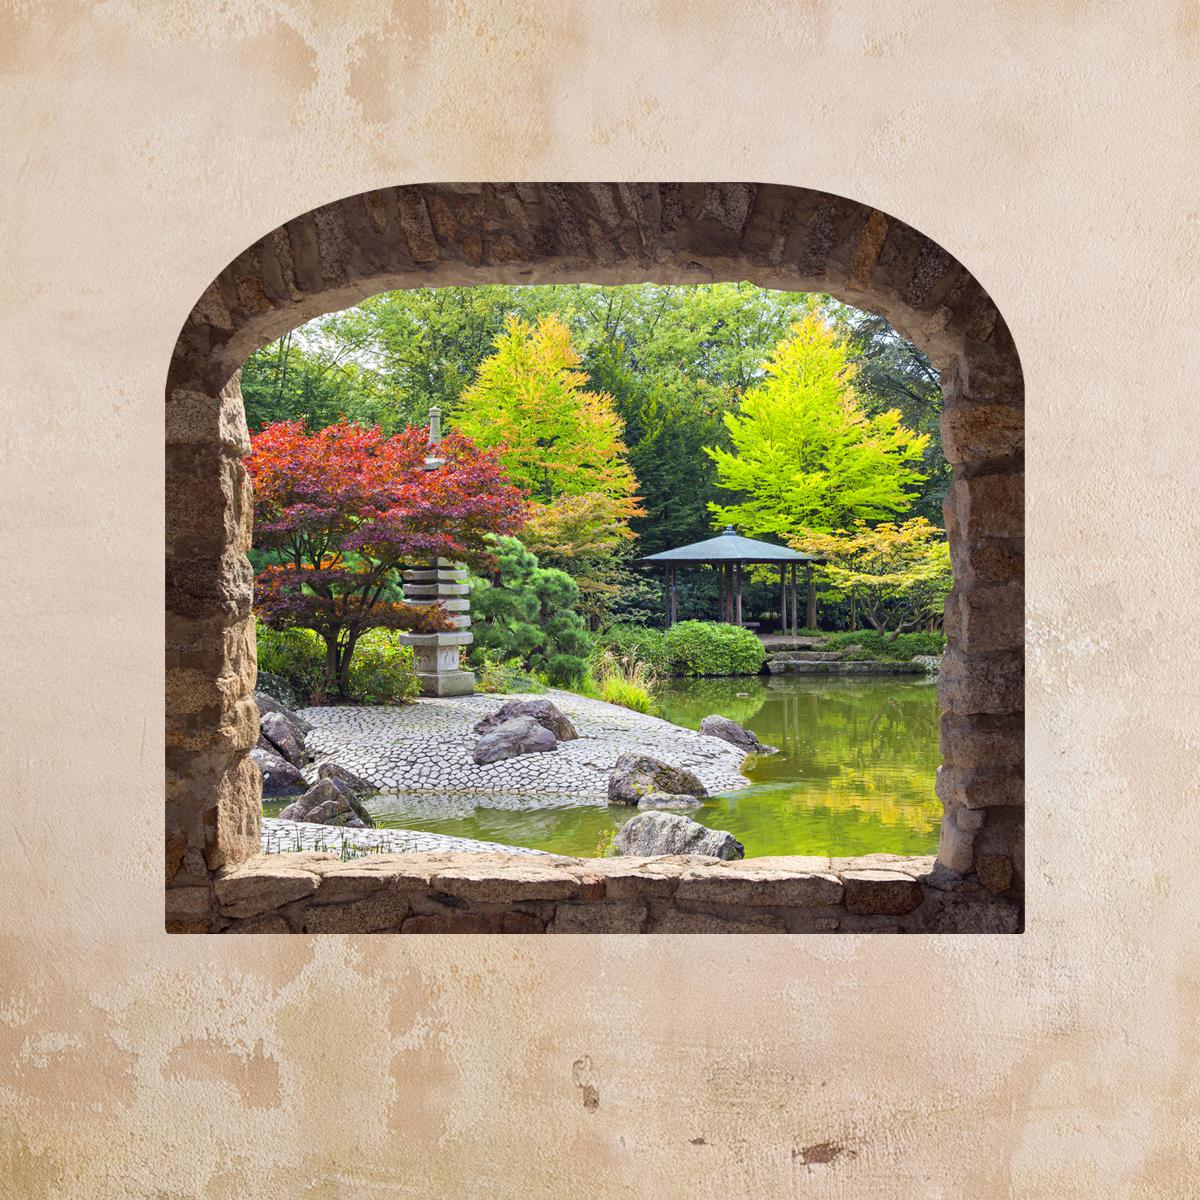 Sticker muraux trompe l\'oeil - Sticker mural Jardin japonais ...